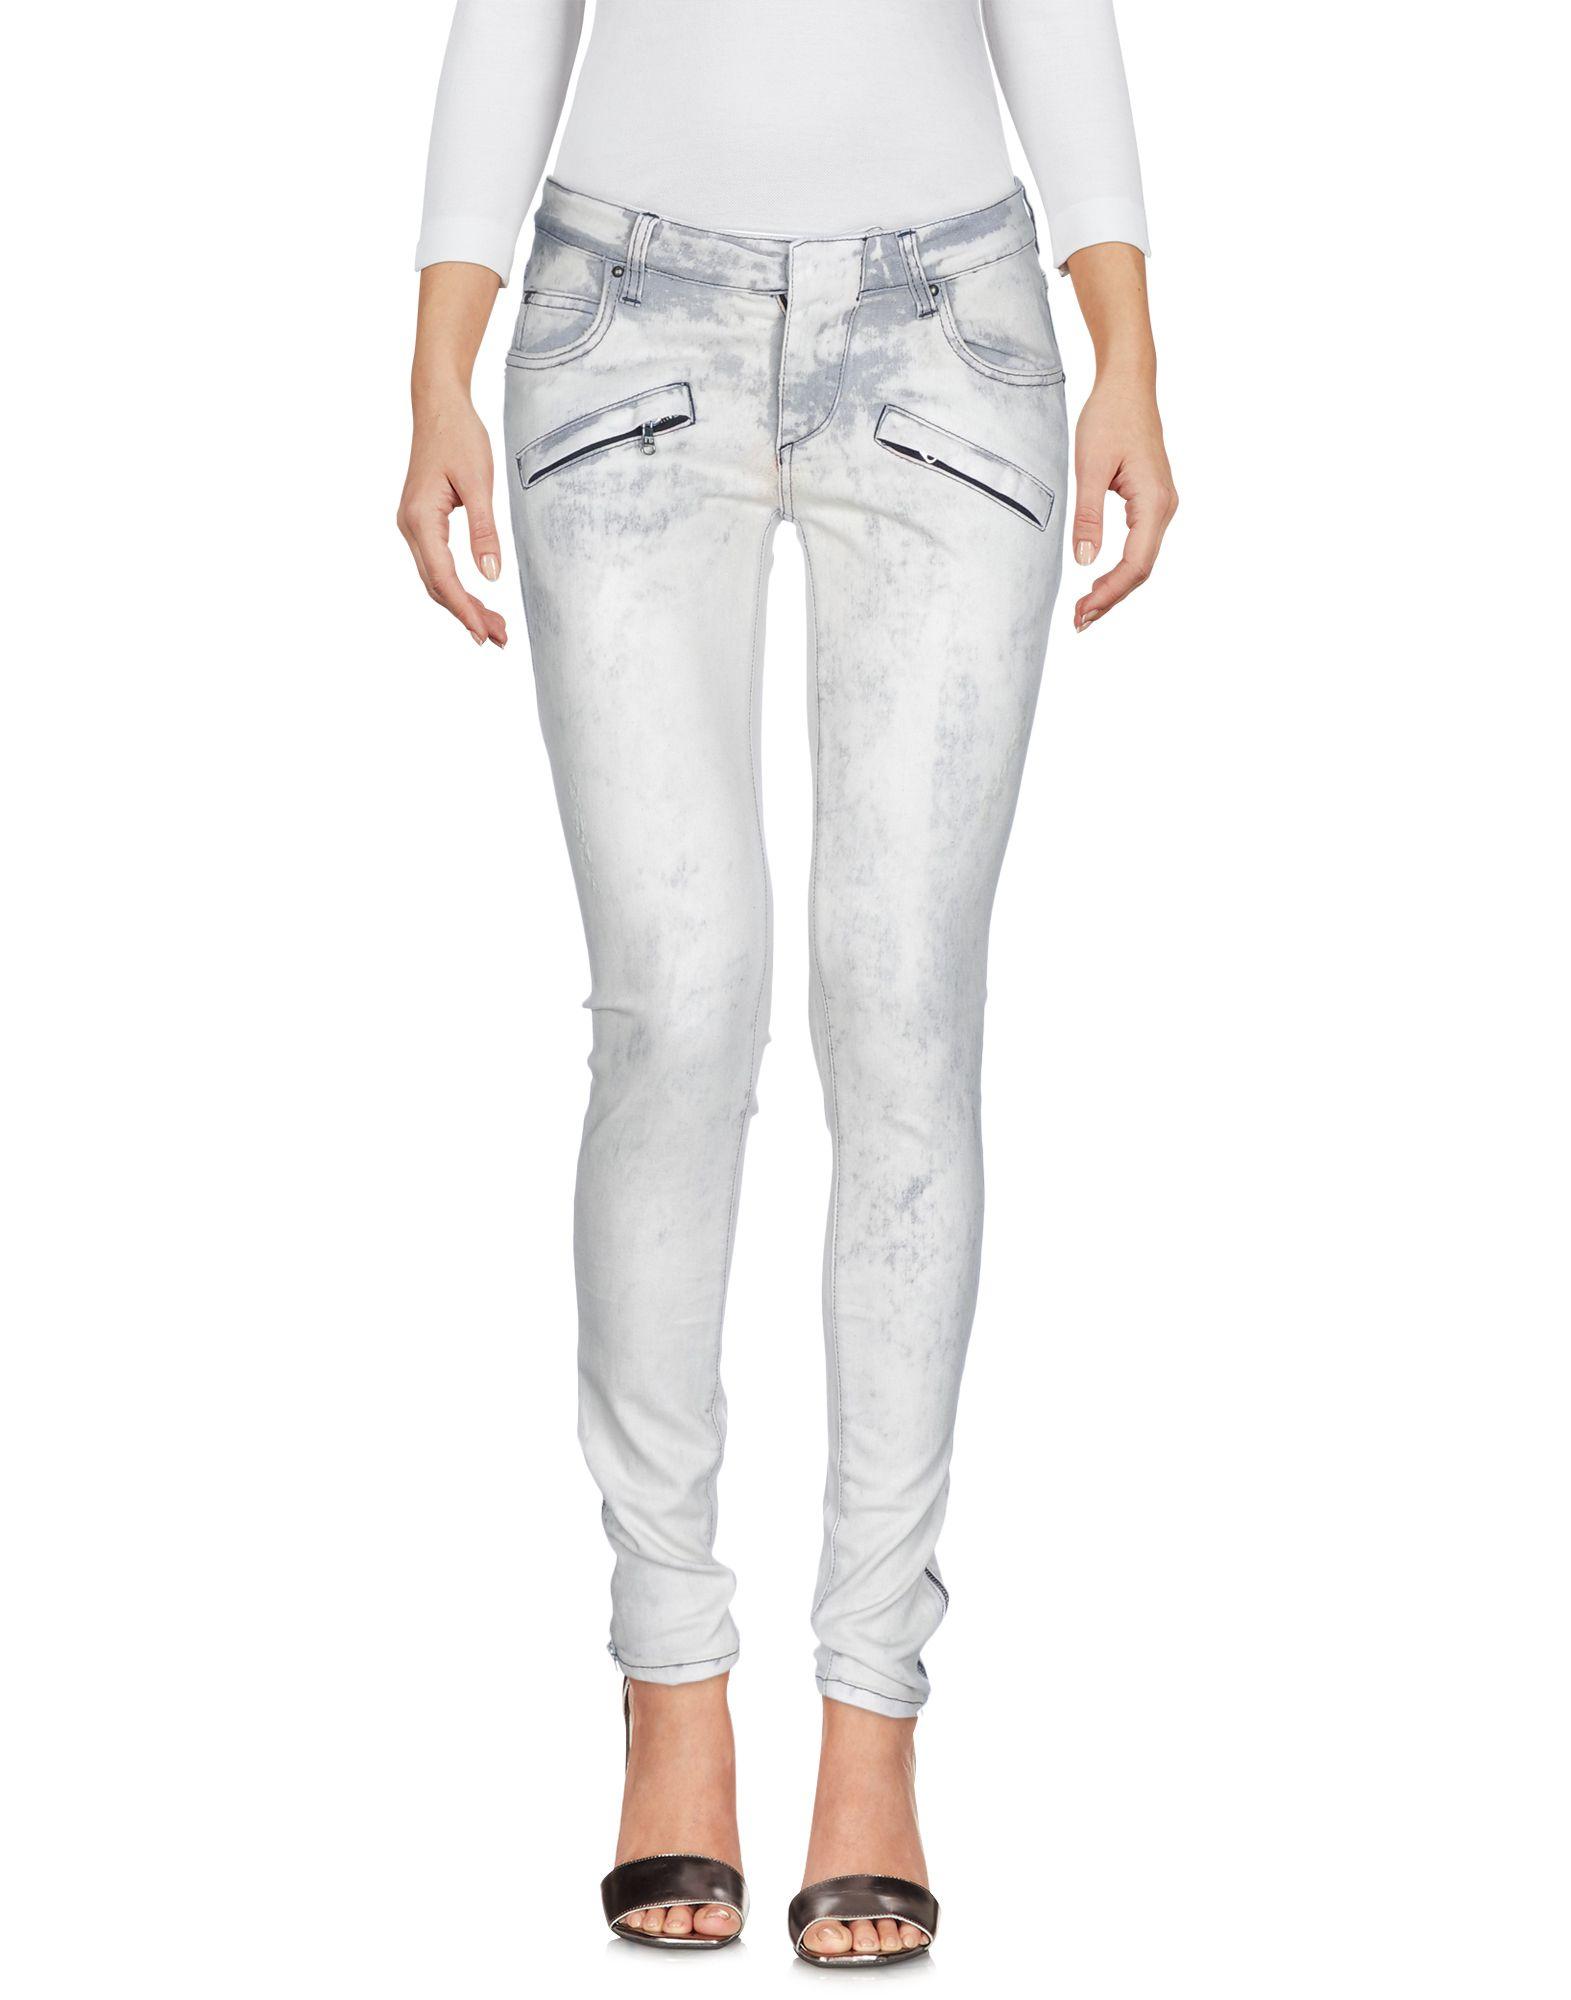 Pantaloni Jeans Pierre Balmain Donna - Acquista online su 3K4ZhwF7F